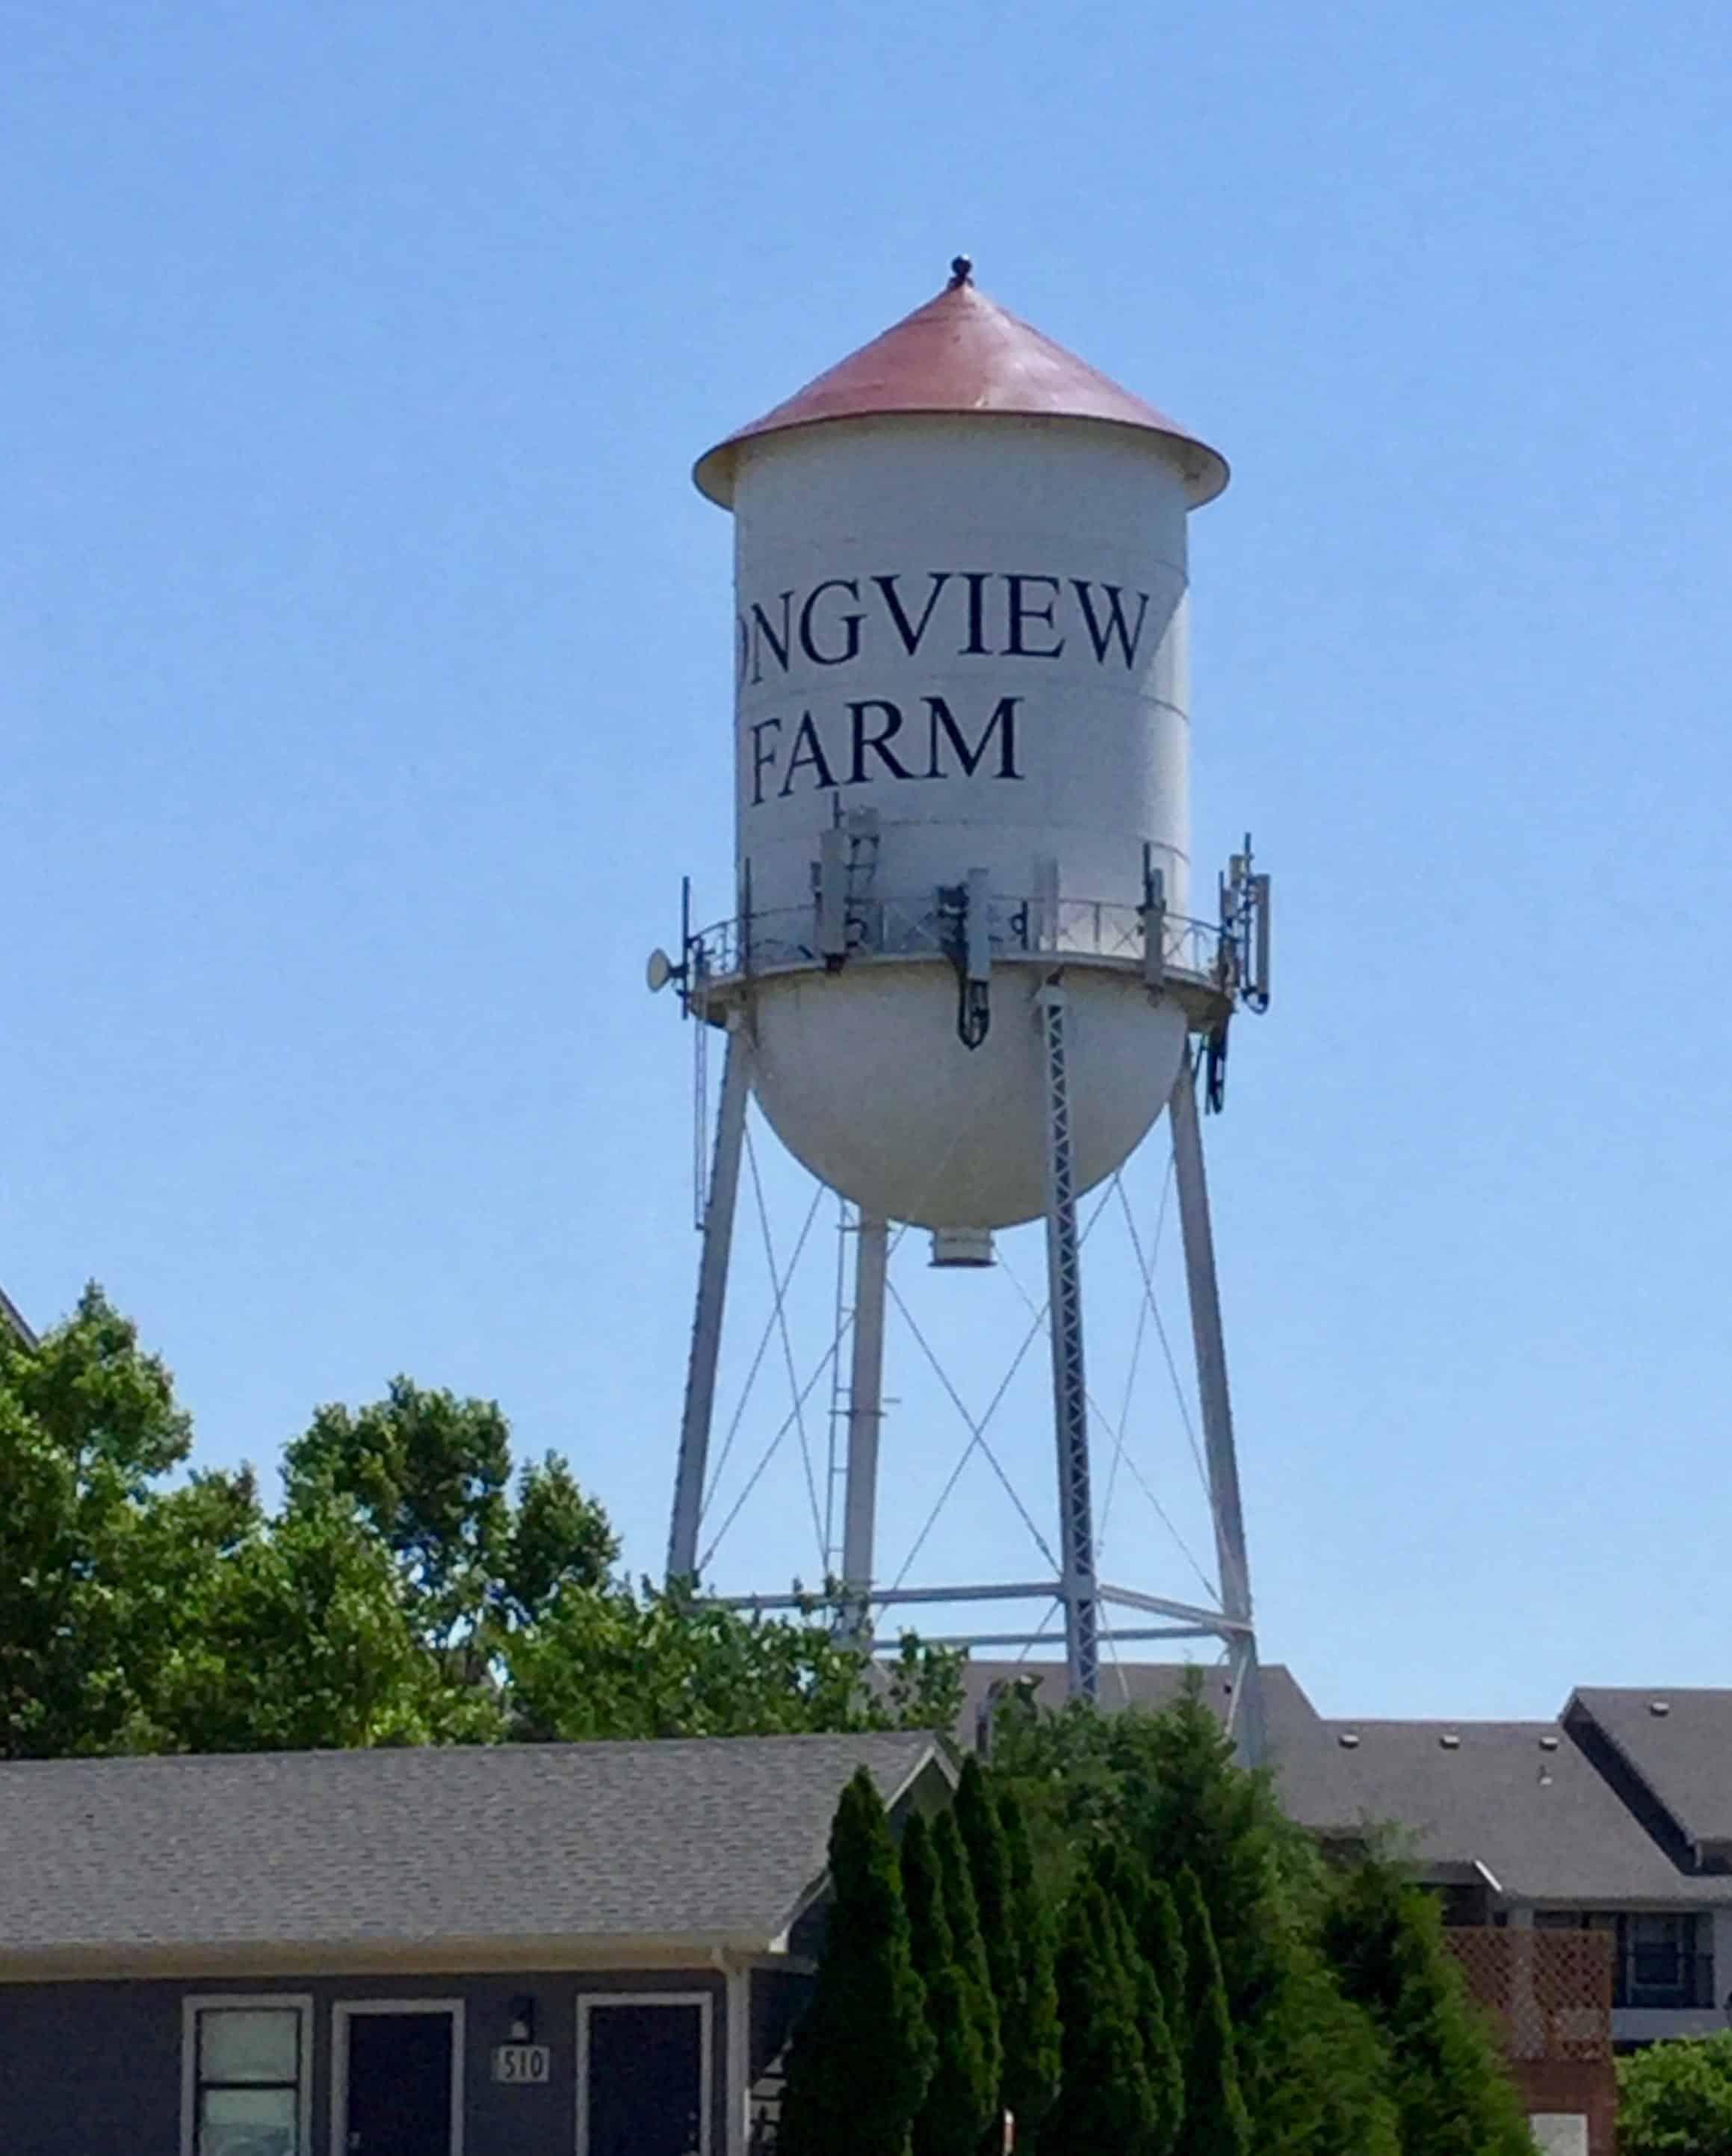 Edwardsville Collage Images